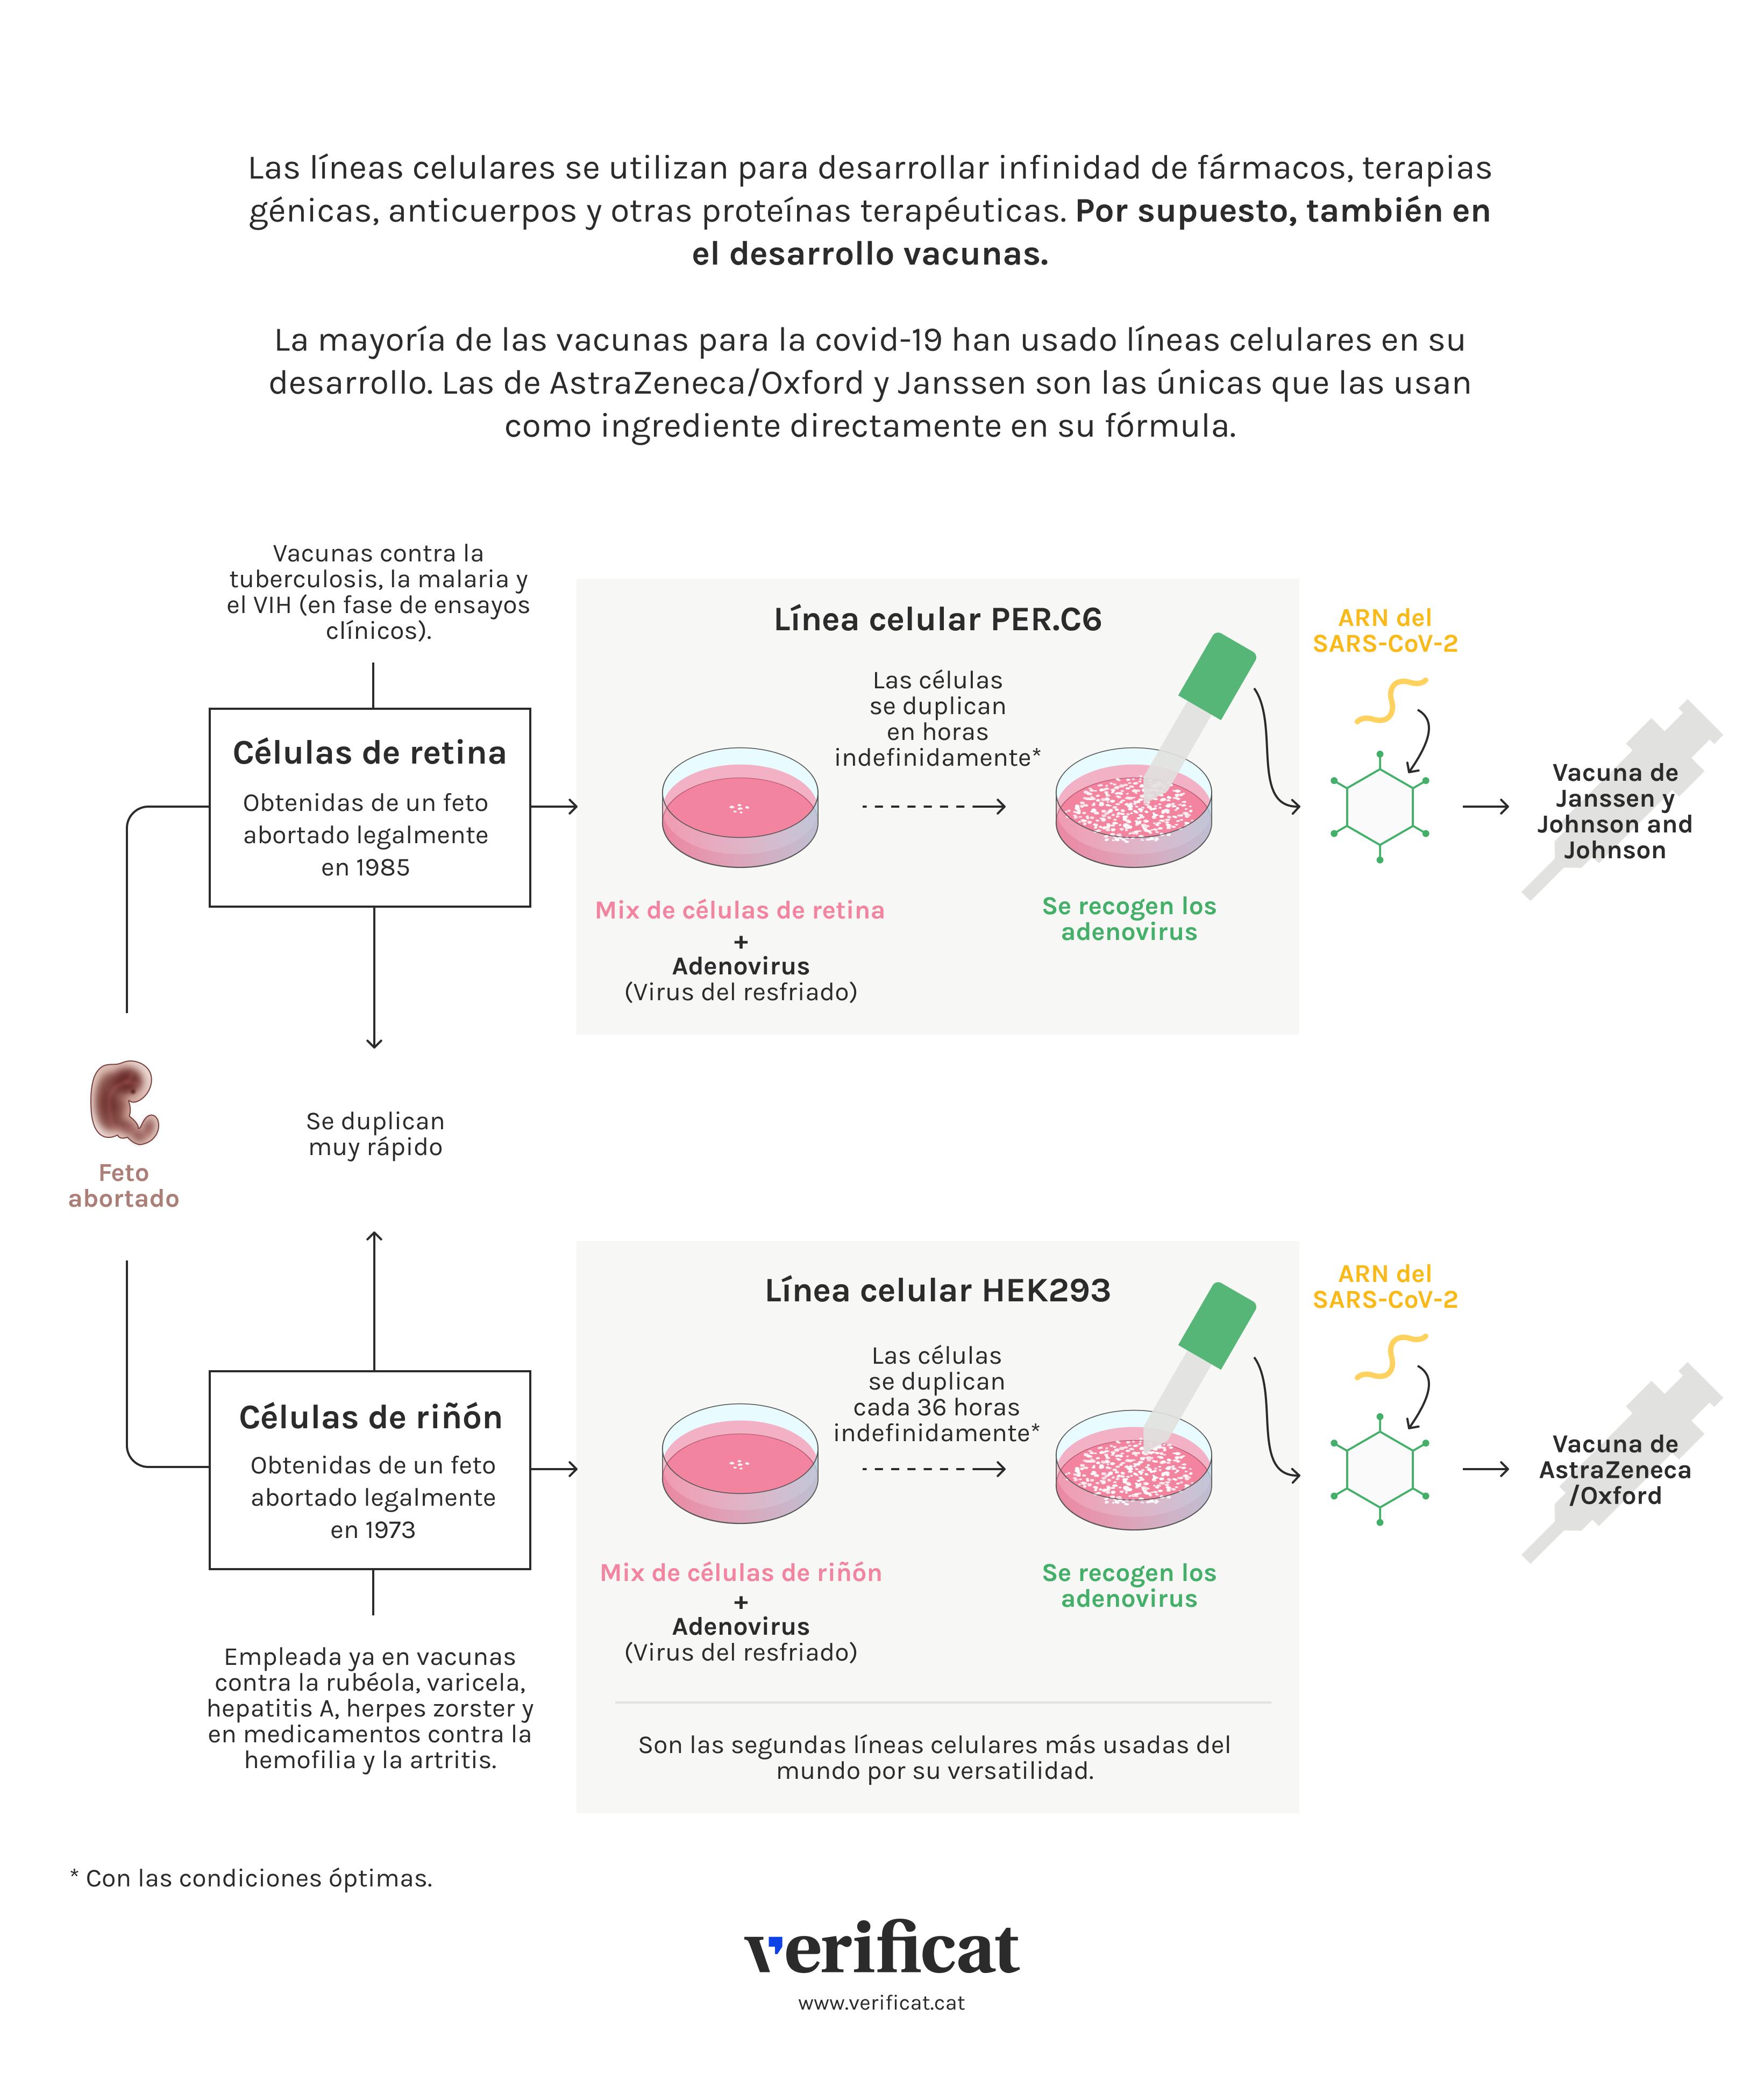 Infografía que explica las líneas celulares